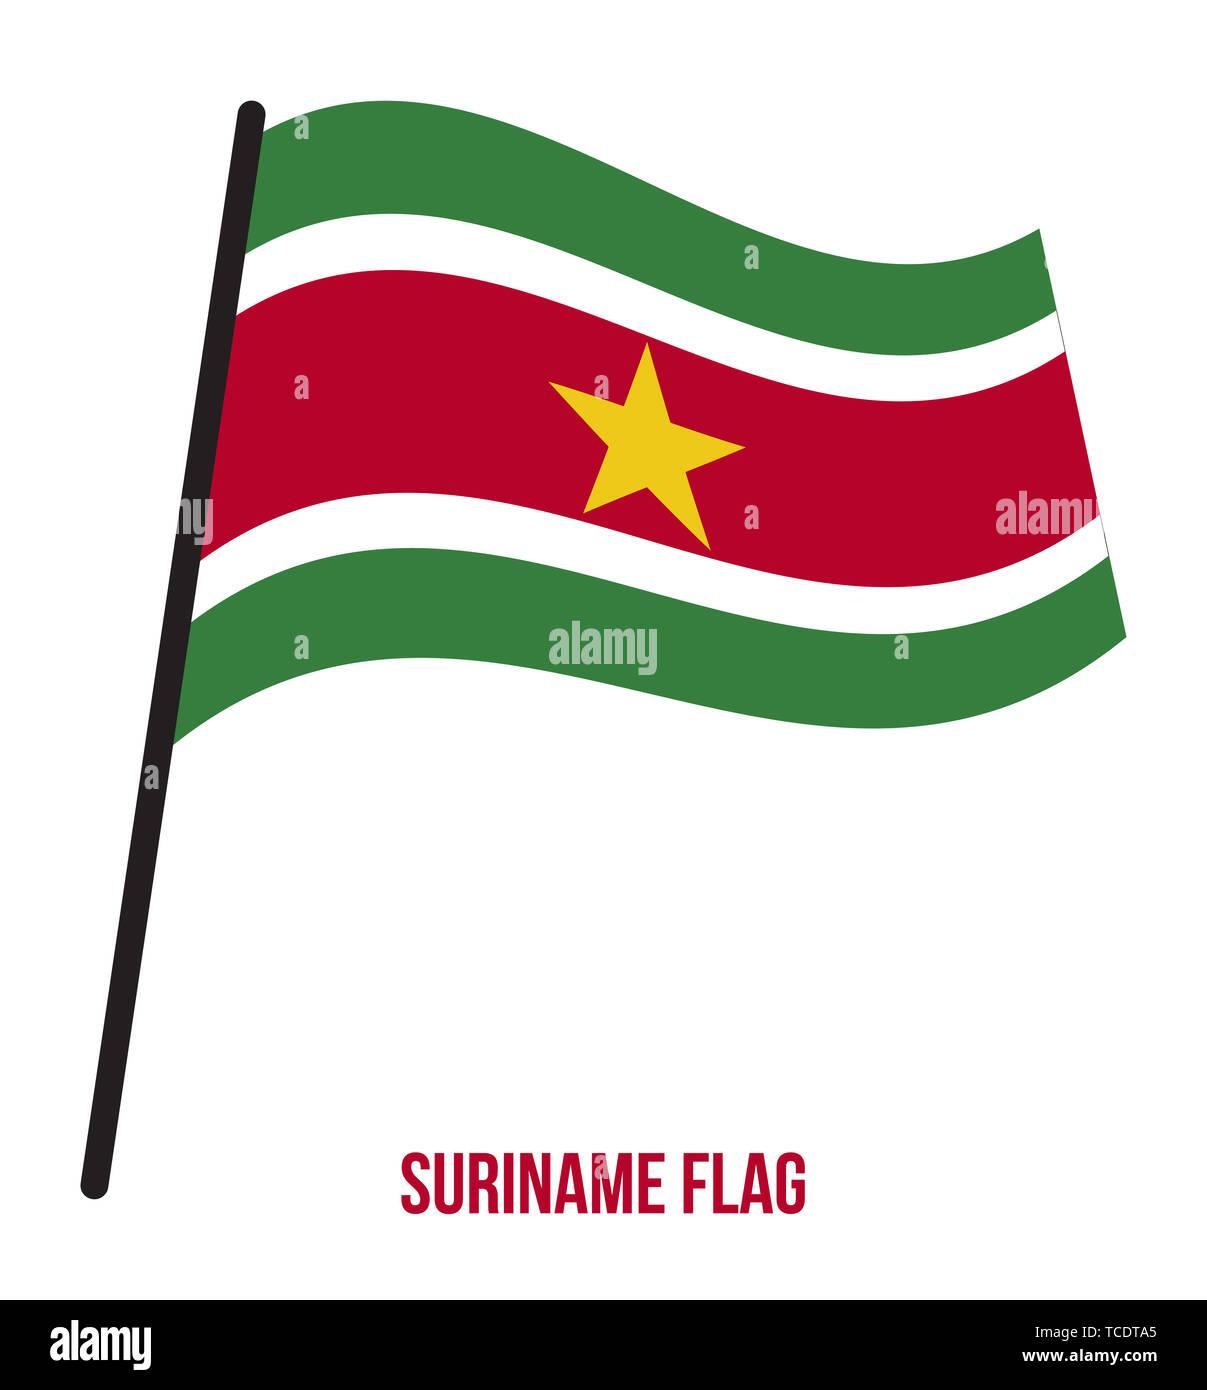 Suriname Flag Waving Vector Illustration on White Background. Suriname National Flag. Stock Photo